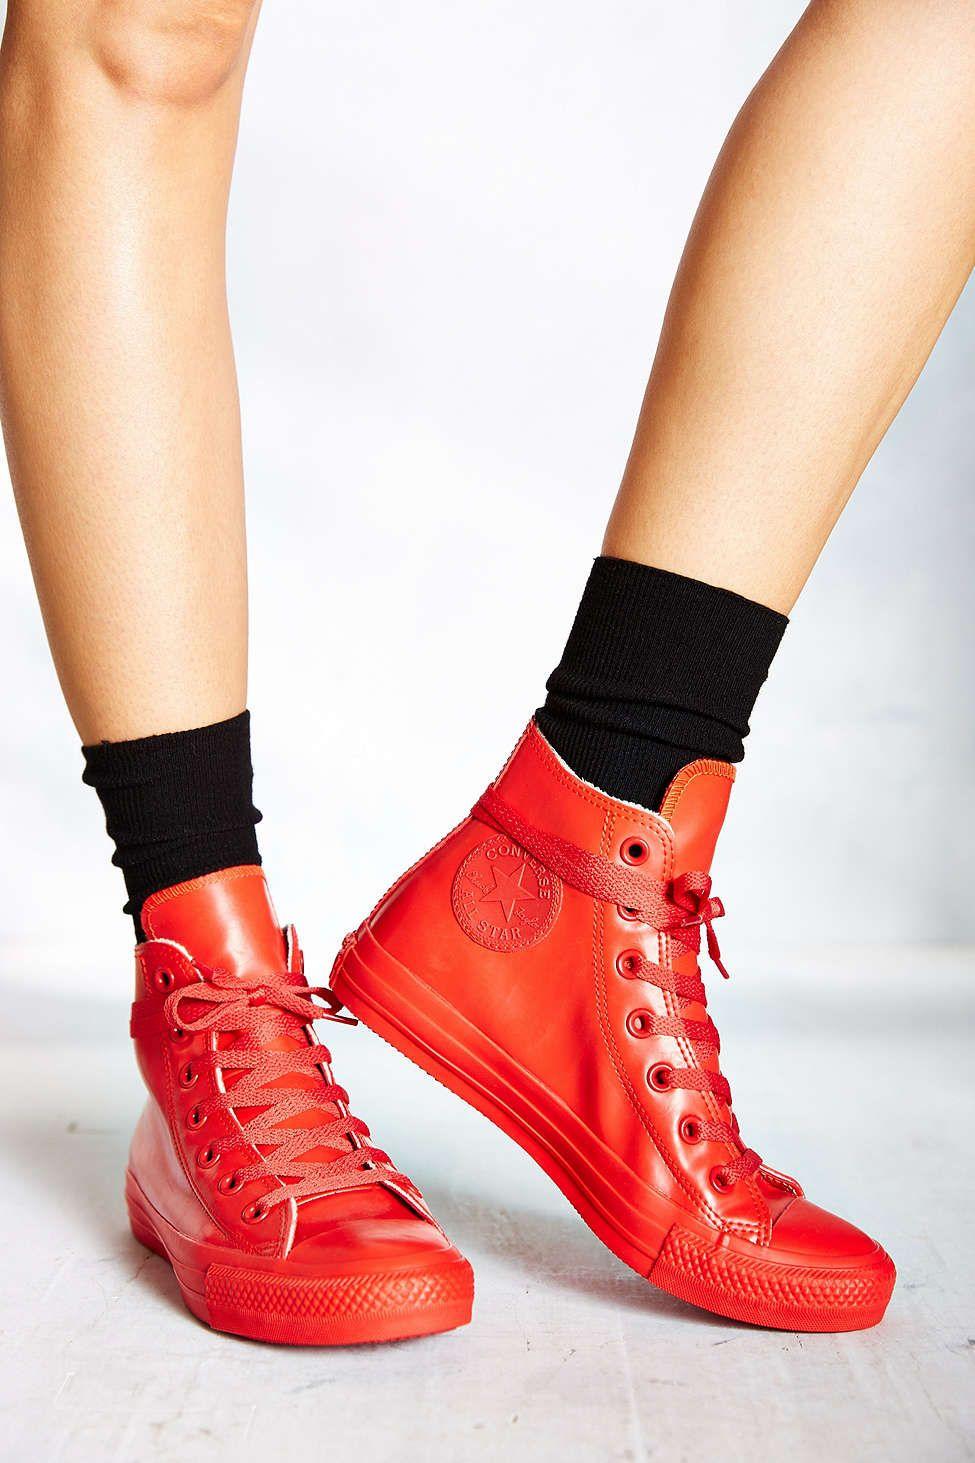 6bf4969d27aa Converse Chuck Taylor All Star Red Rubber Women s High-Top Sneaker ...